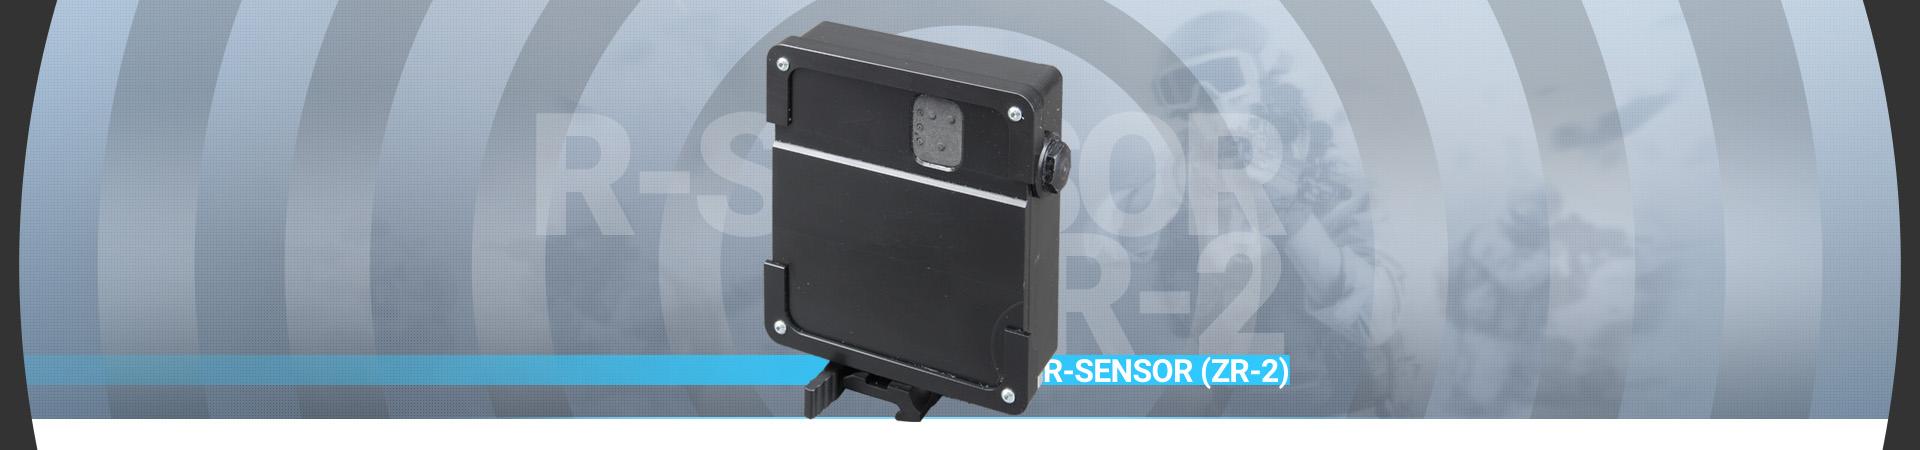 r-sensor zr-2